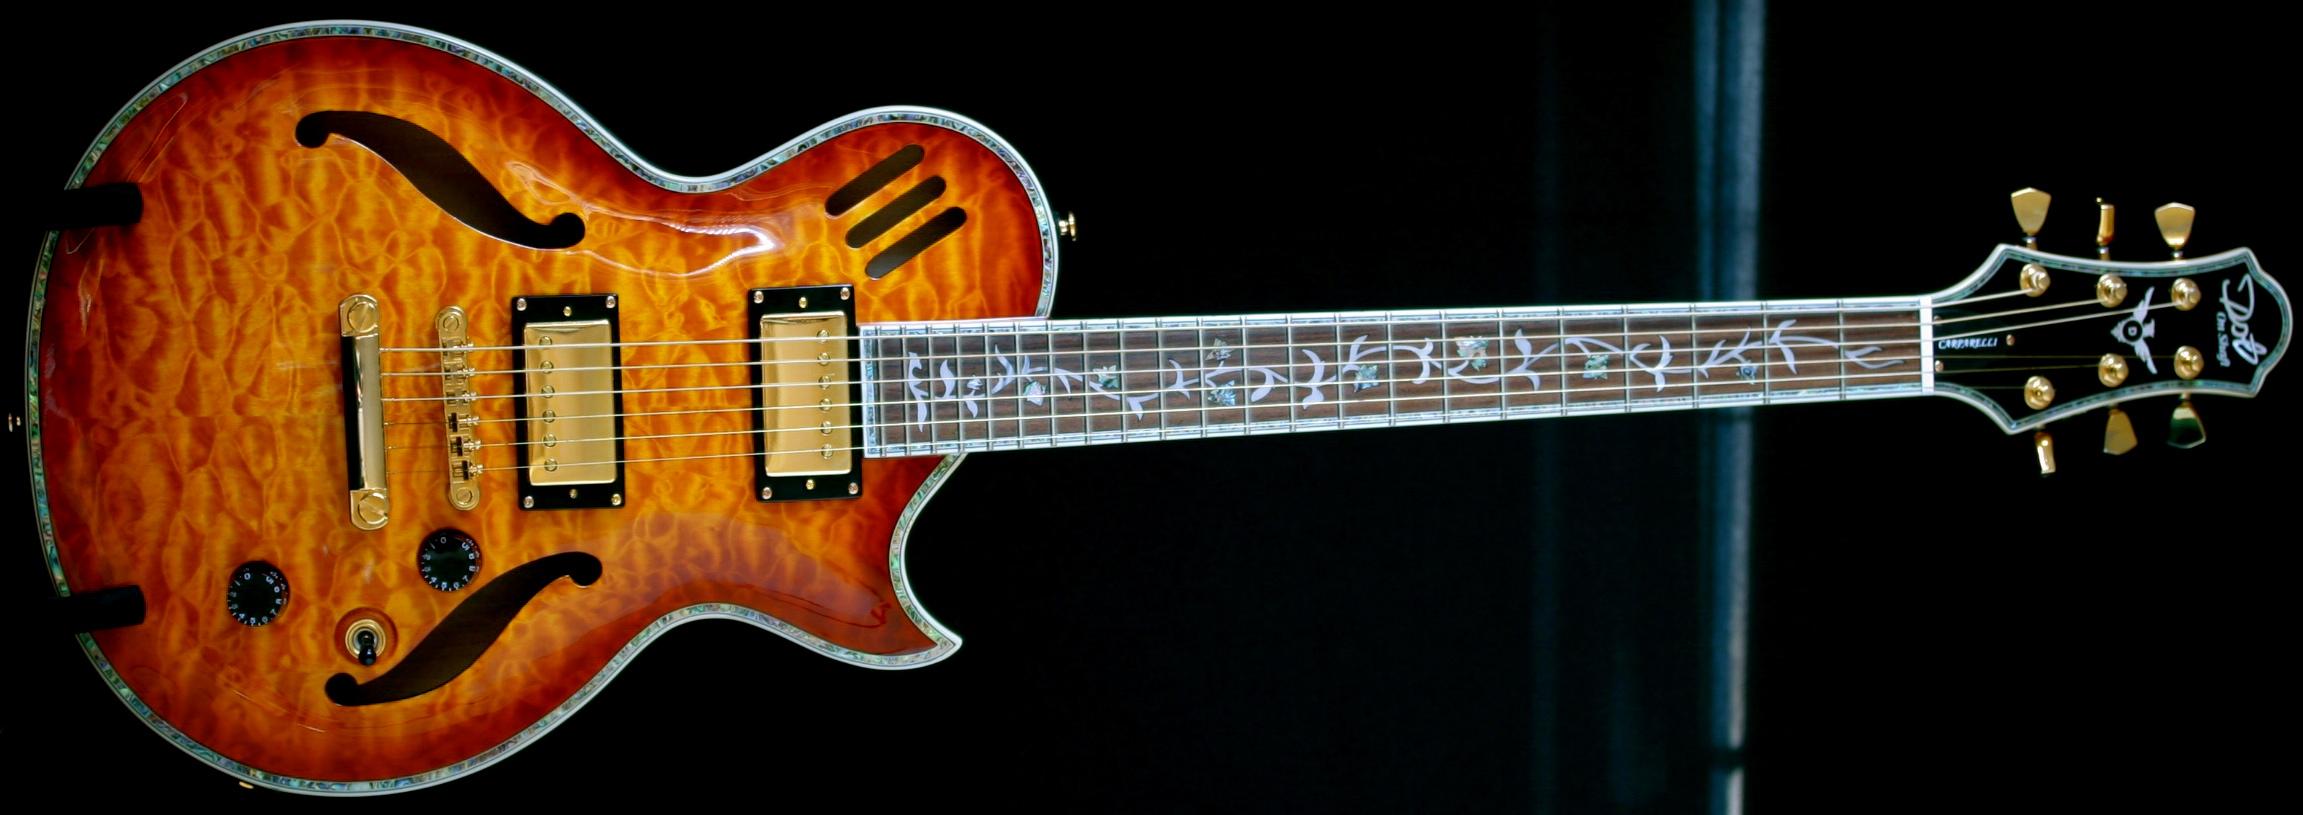 Rise and Fall of DOS – Carparelli S2 Les Paul Style Guitar No Mo!